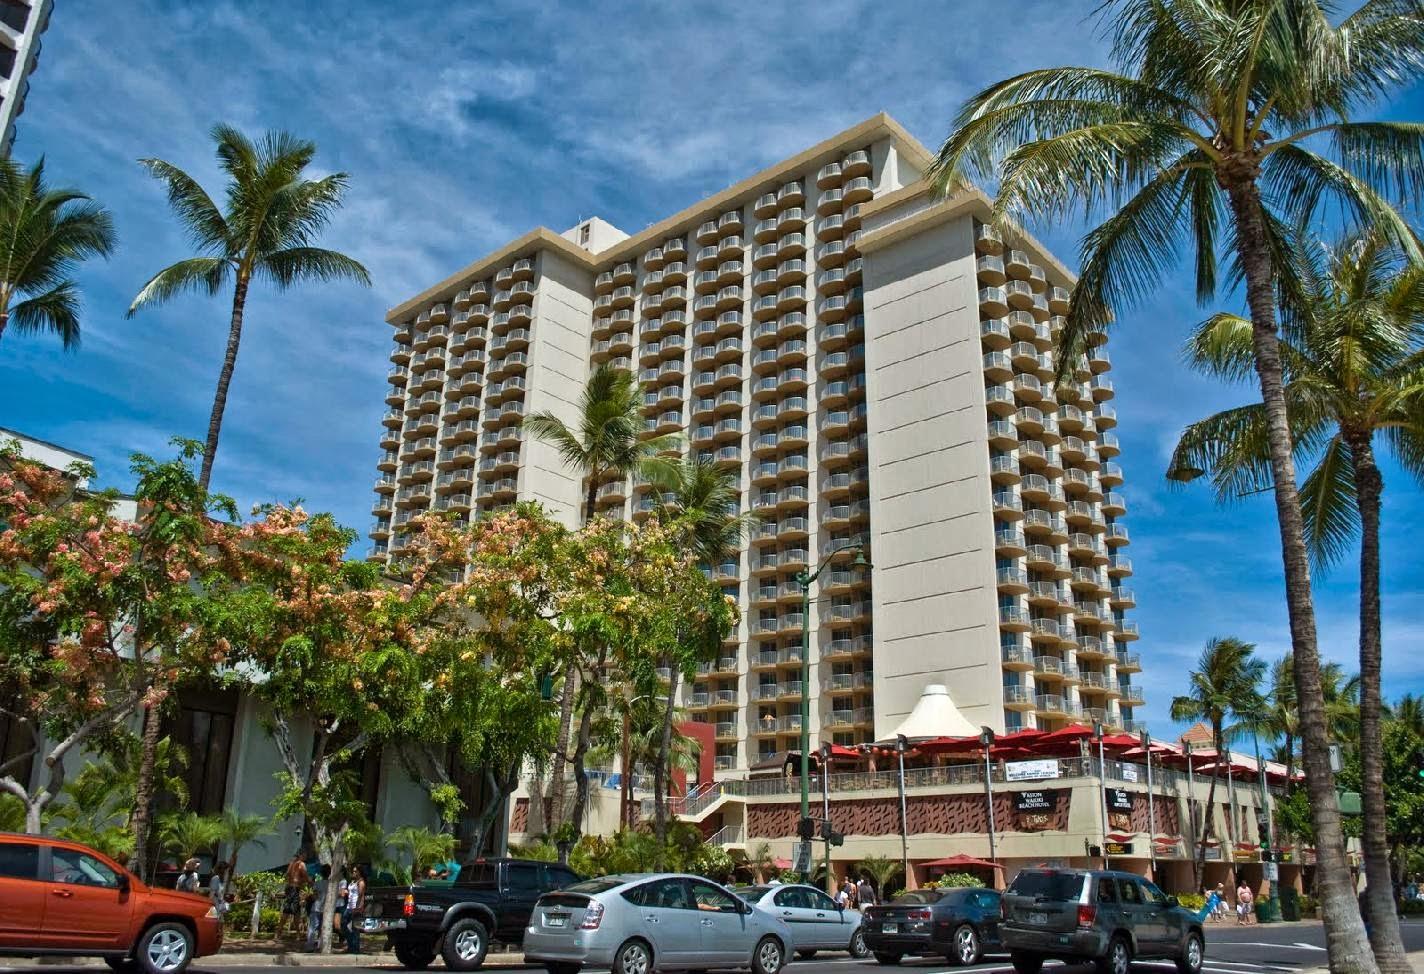 Waikiki Beach Wallpaper Hd: Best Beach Pictures